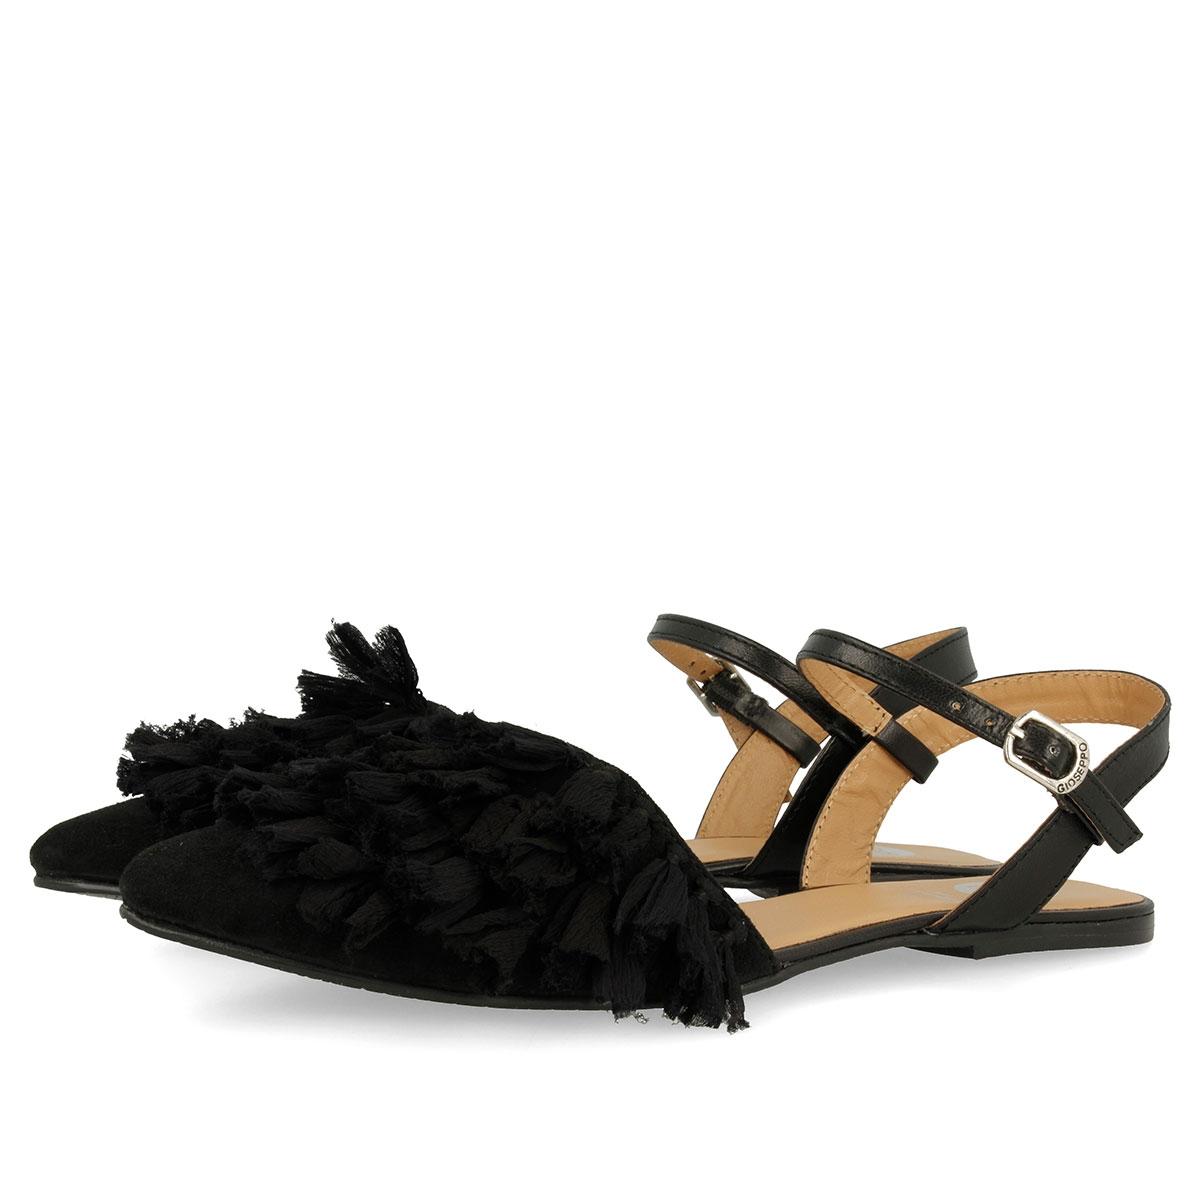 Cubierta En Negro Para Sandalias Mujer Con 44356 Punta rtsdxhQCoB